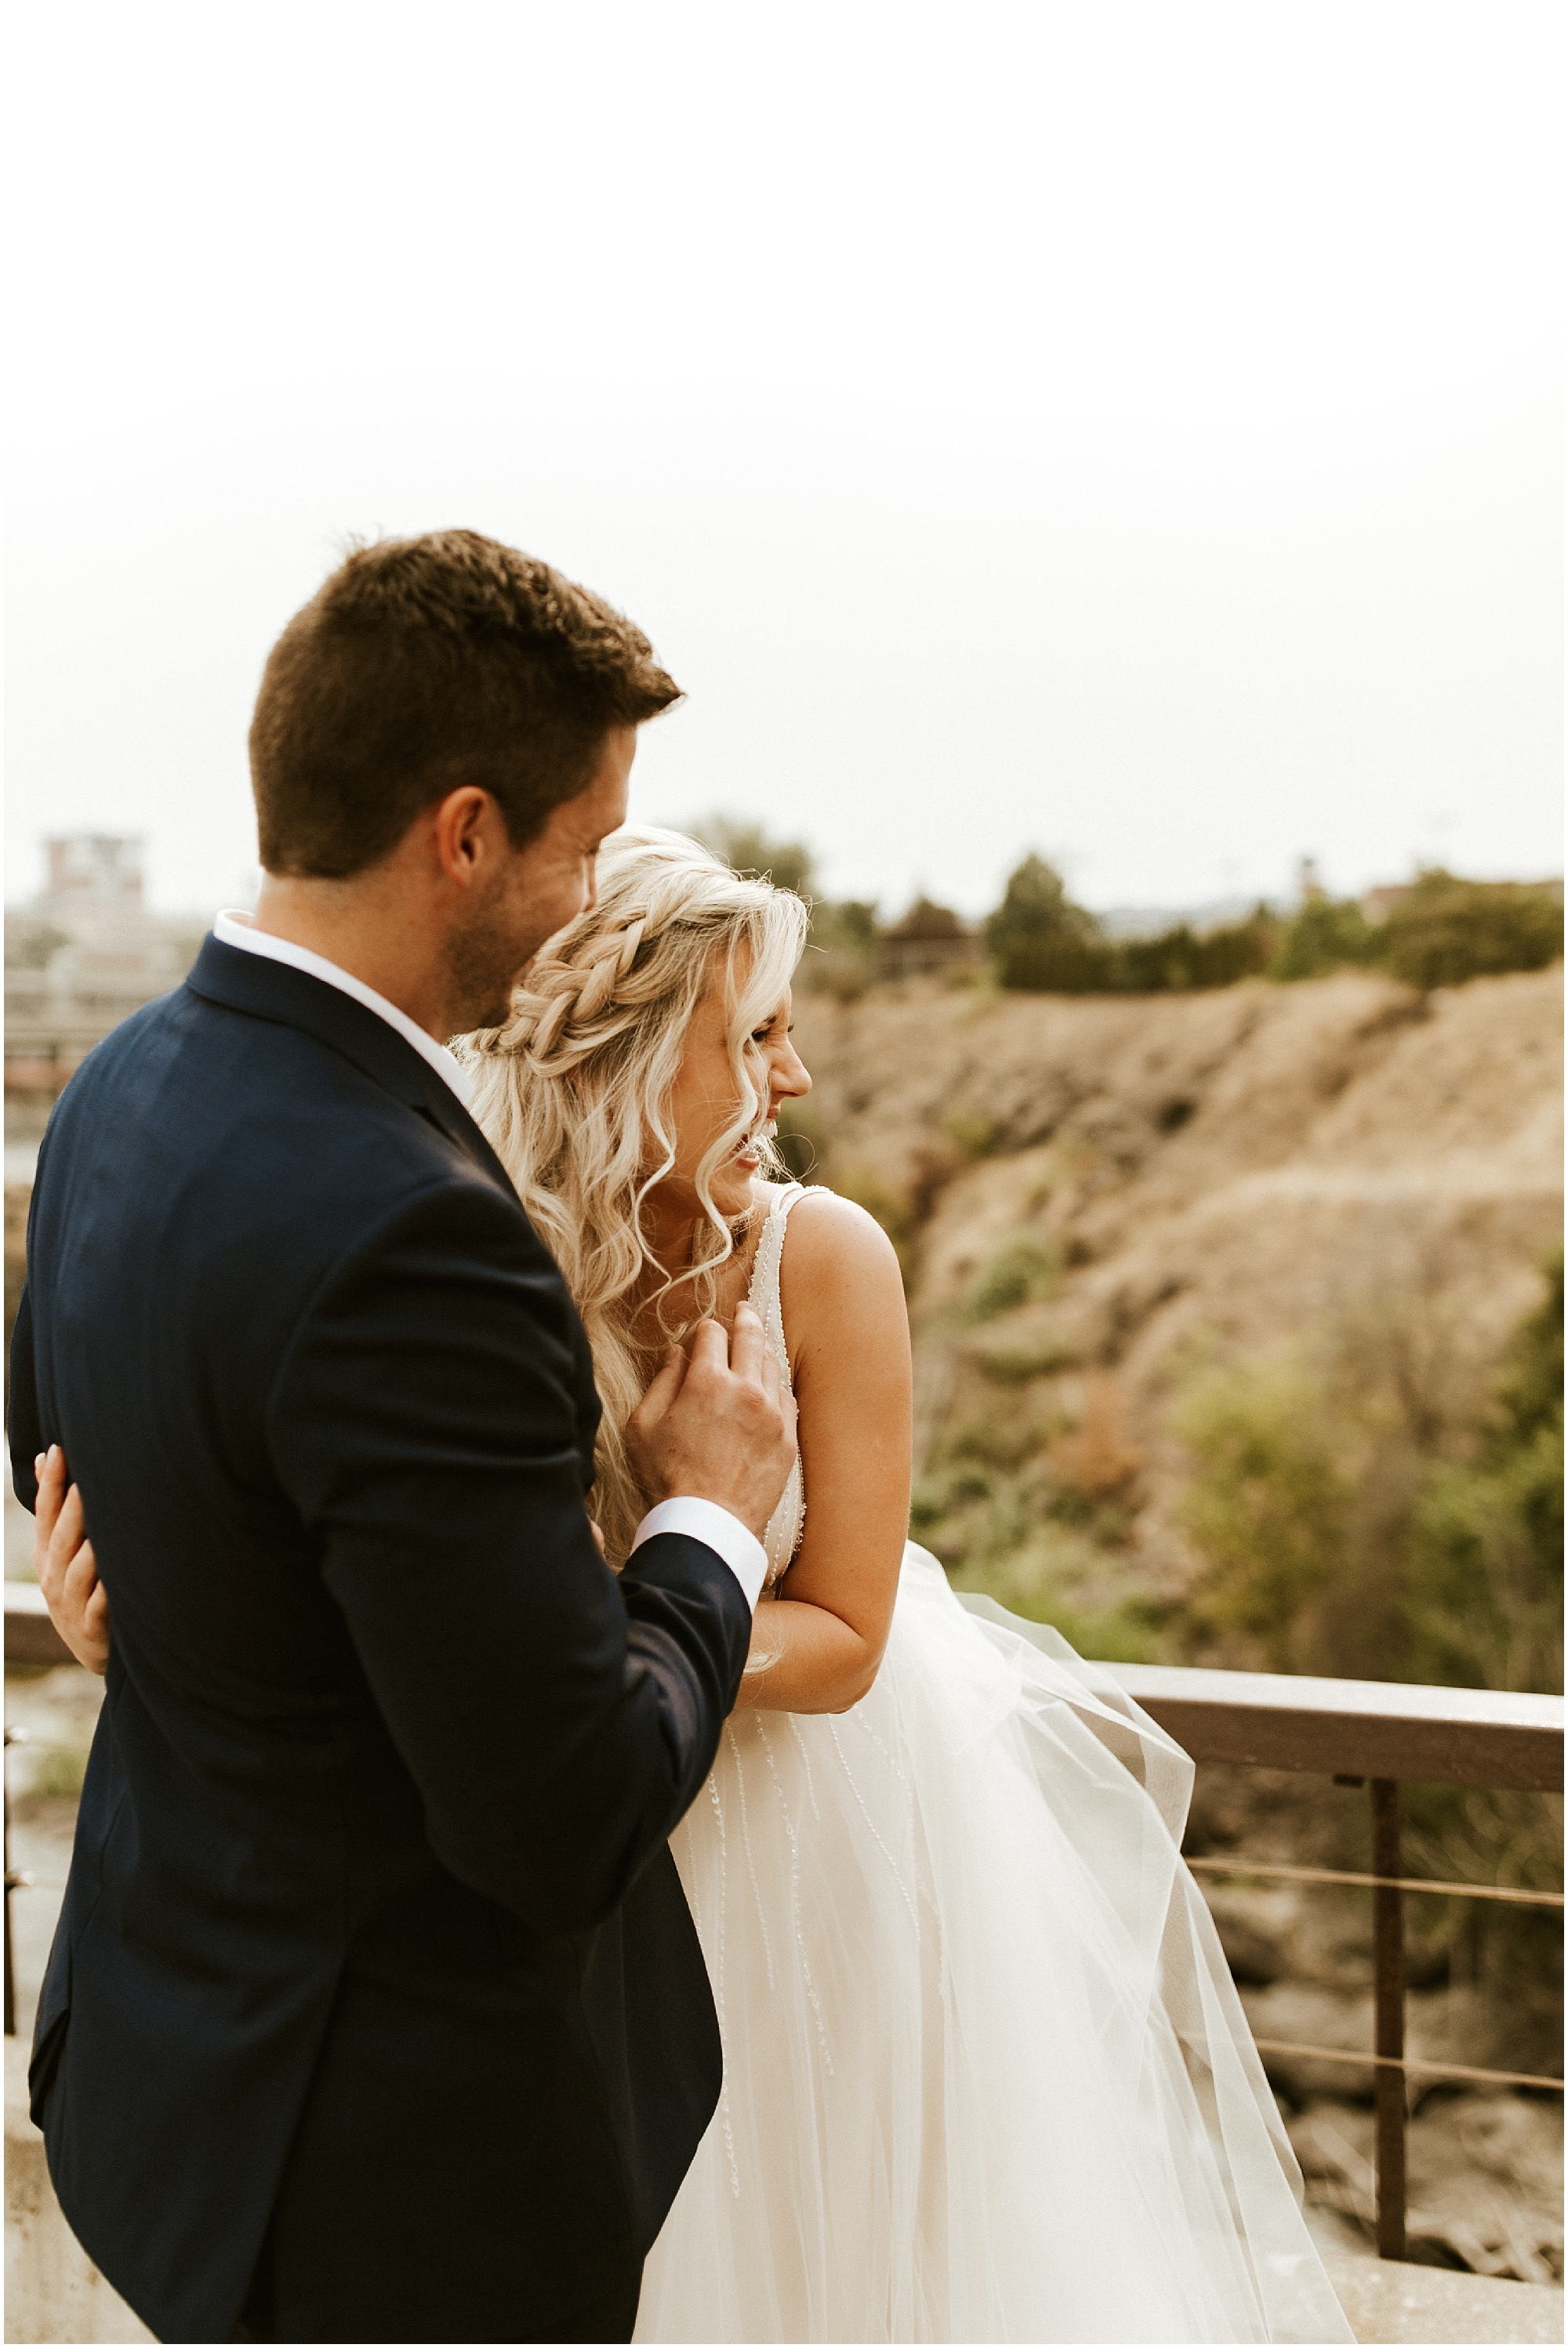 Chateau Rive Spokane Wedding Cassie Trottier Photography1035.jpg